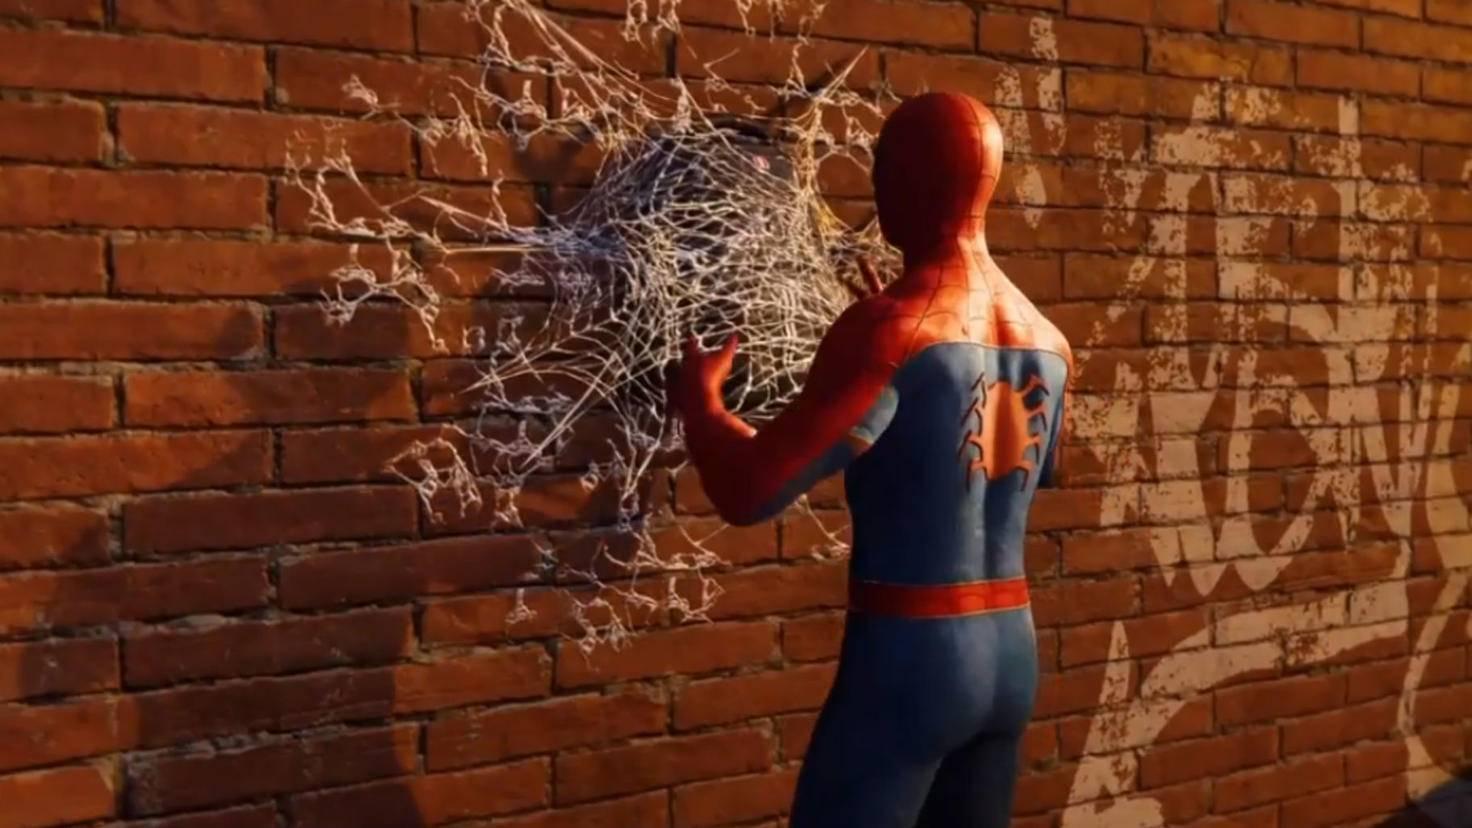 spider-man-ps4-rucksack-screenshot